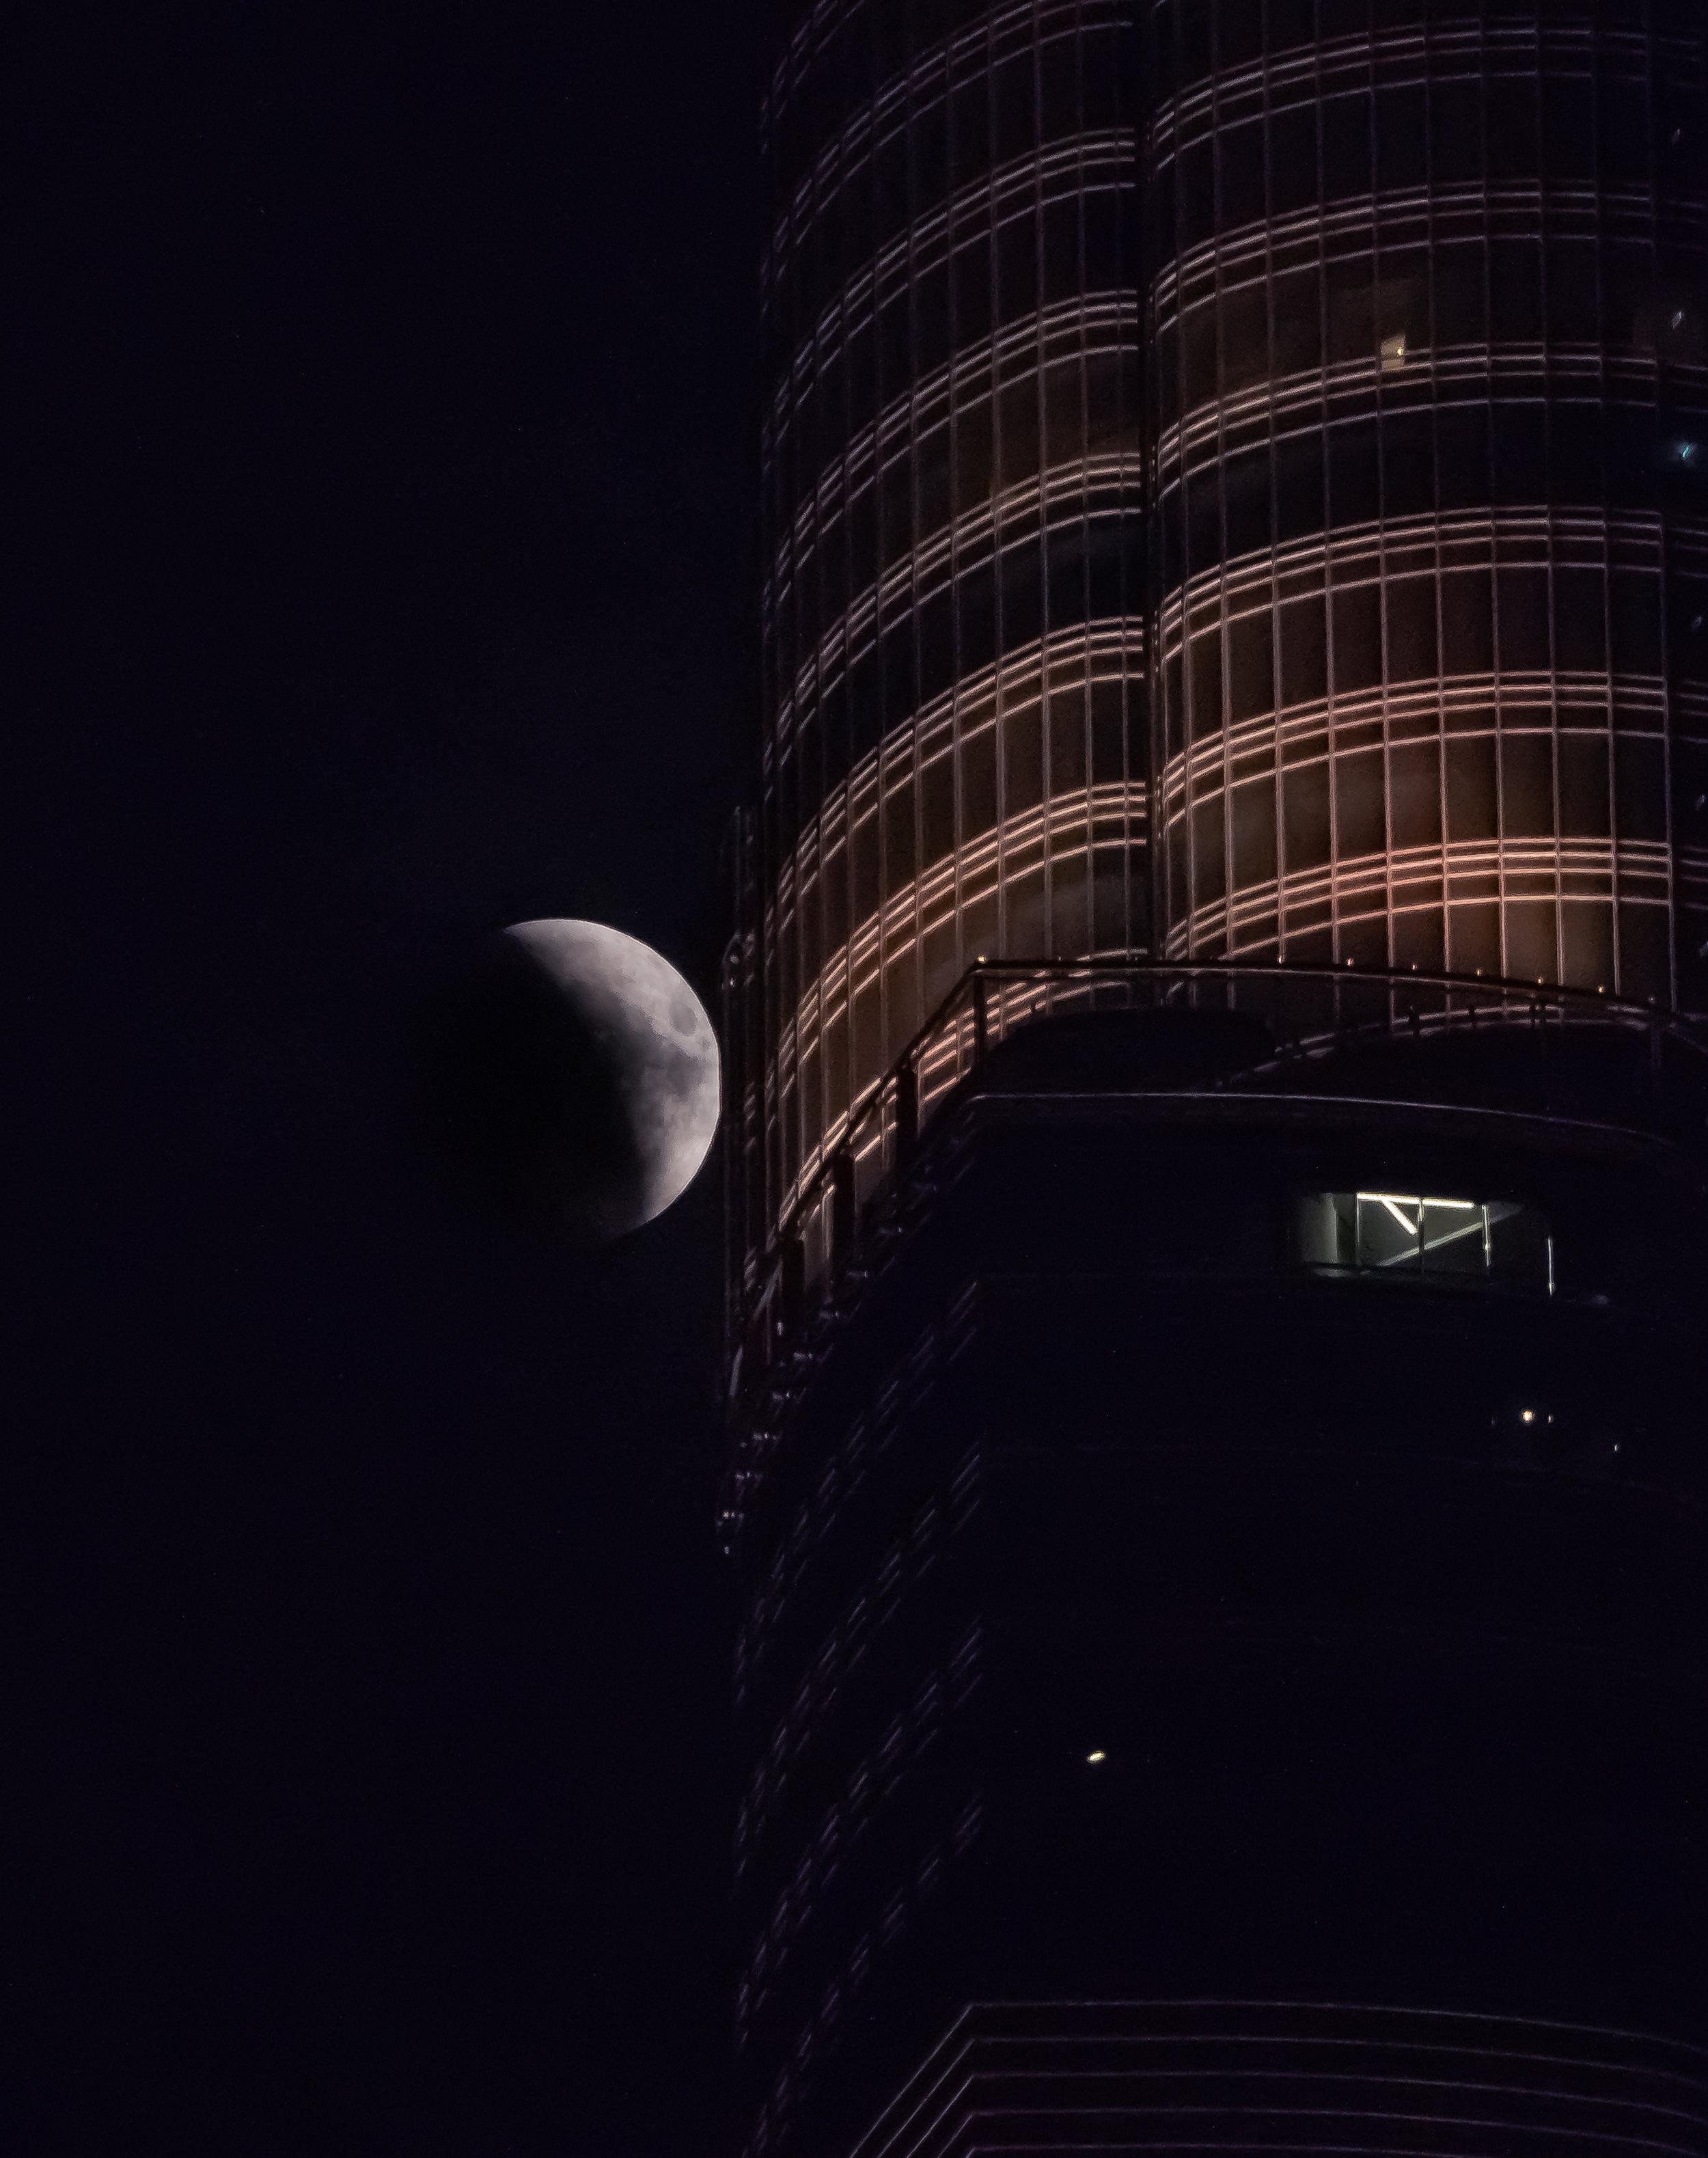 Passing Burj Khalifa